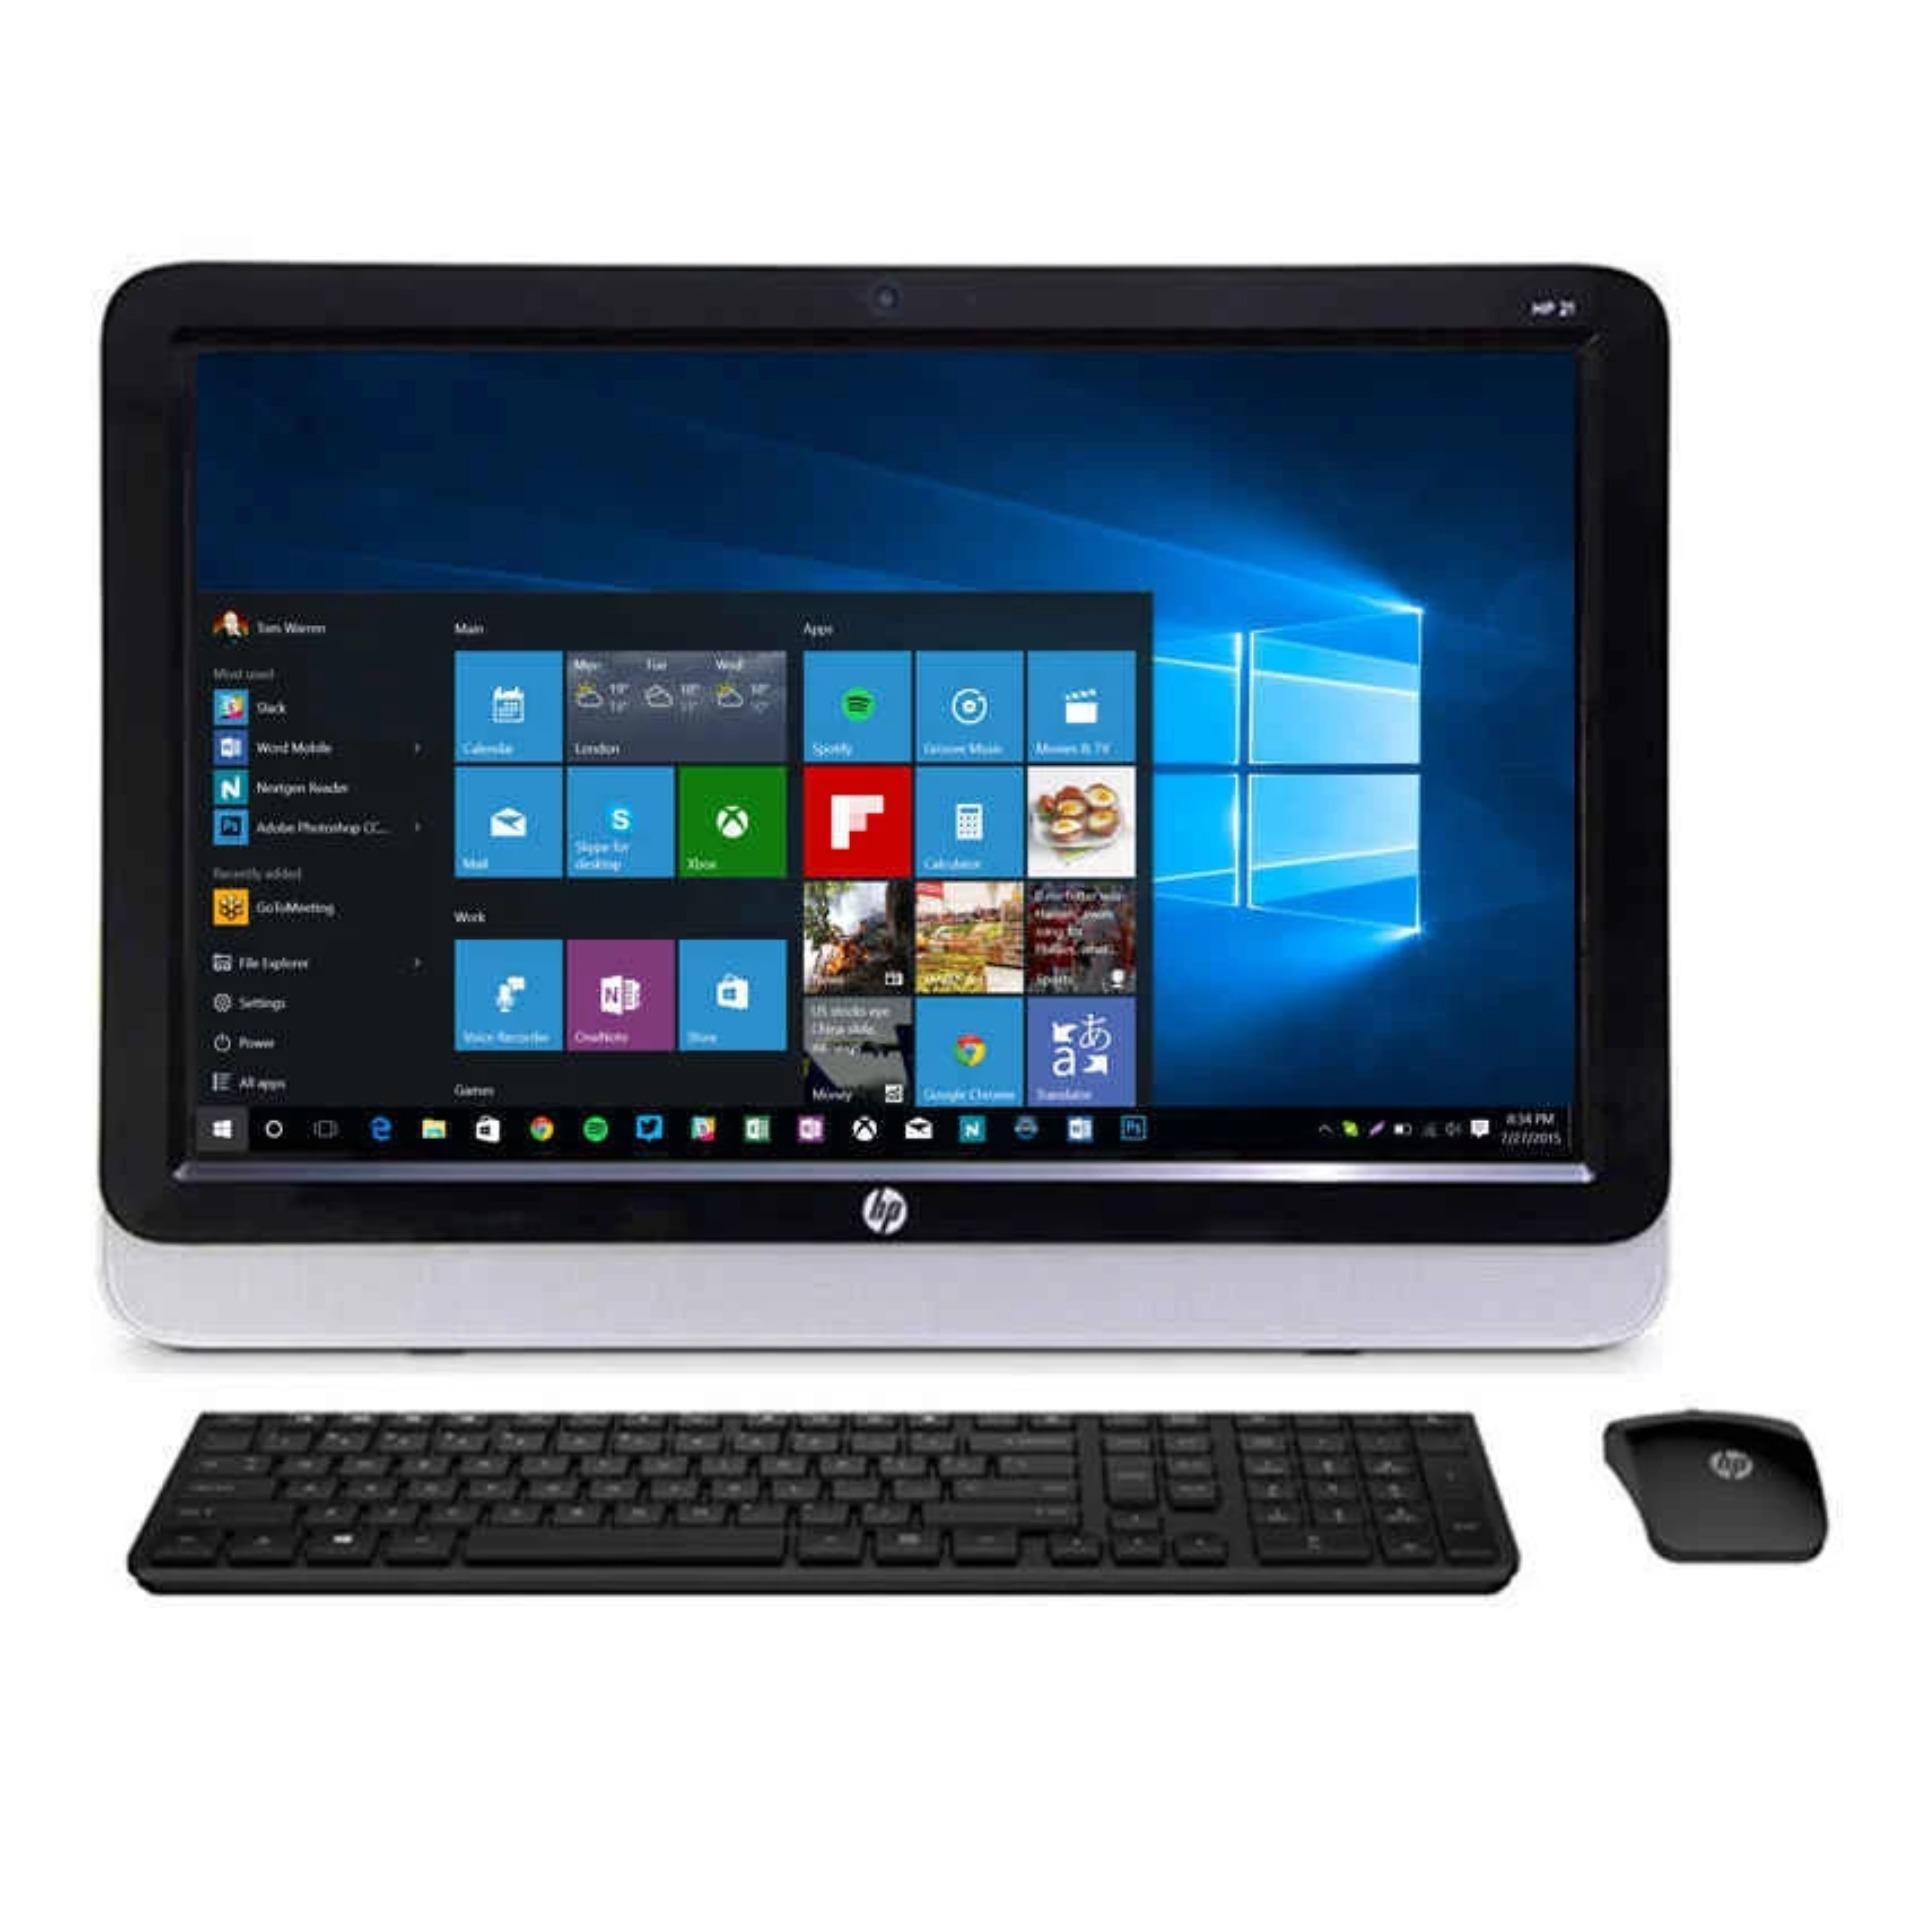 Lenovo Ip 700 151sk I7 6700 8gb 1tb Ssd128gb Vga Gtx950 4gb Win10 Ideacenter 300 20ish 09id Core I5 6400 1 Year Warranty Hp Pc All In One 20 R124d Intel 4460